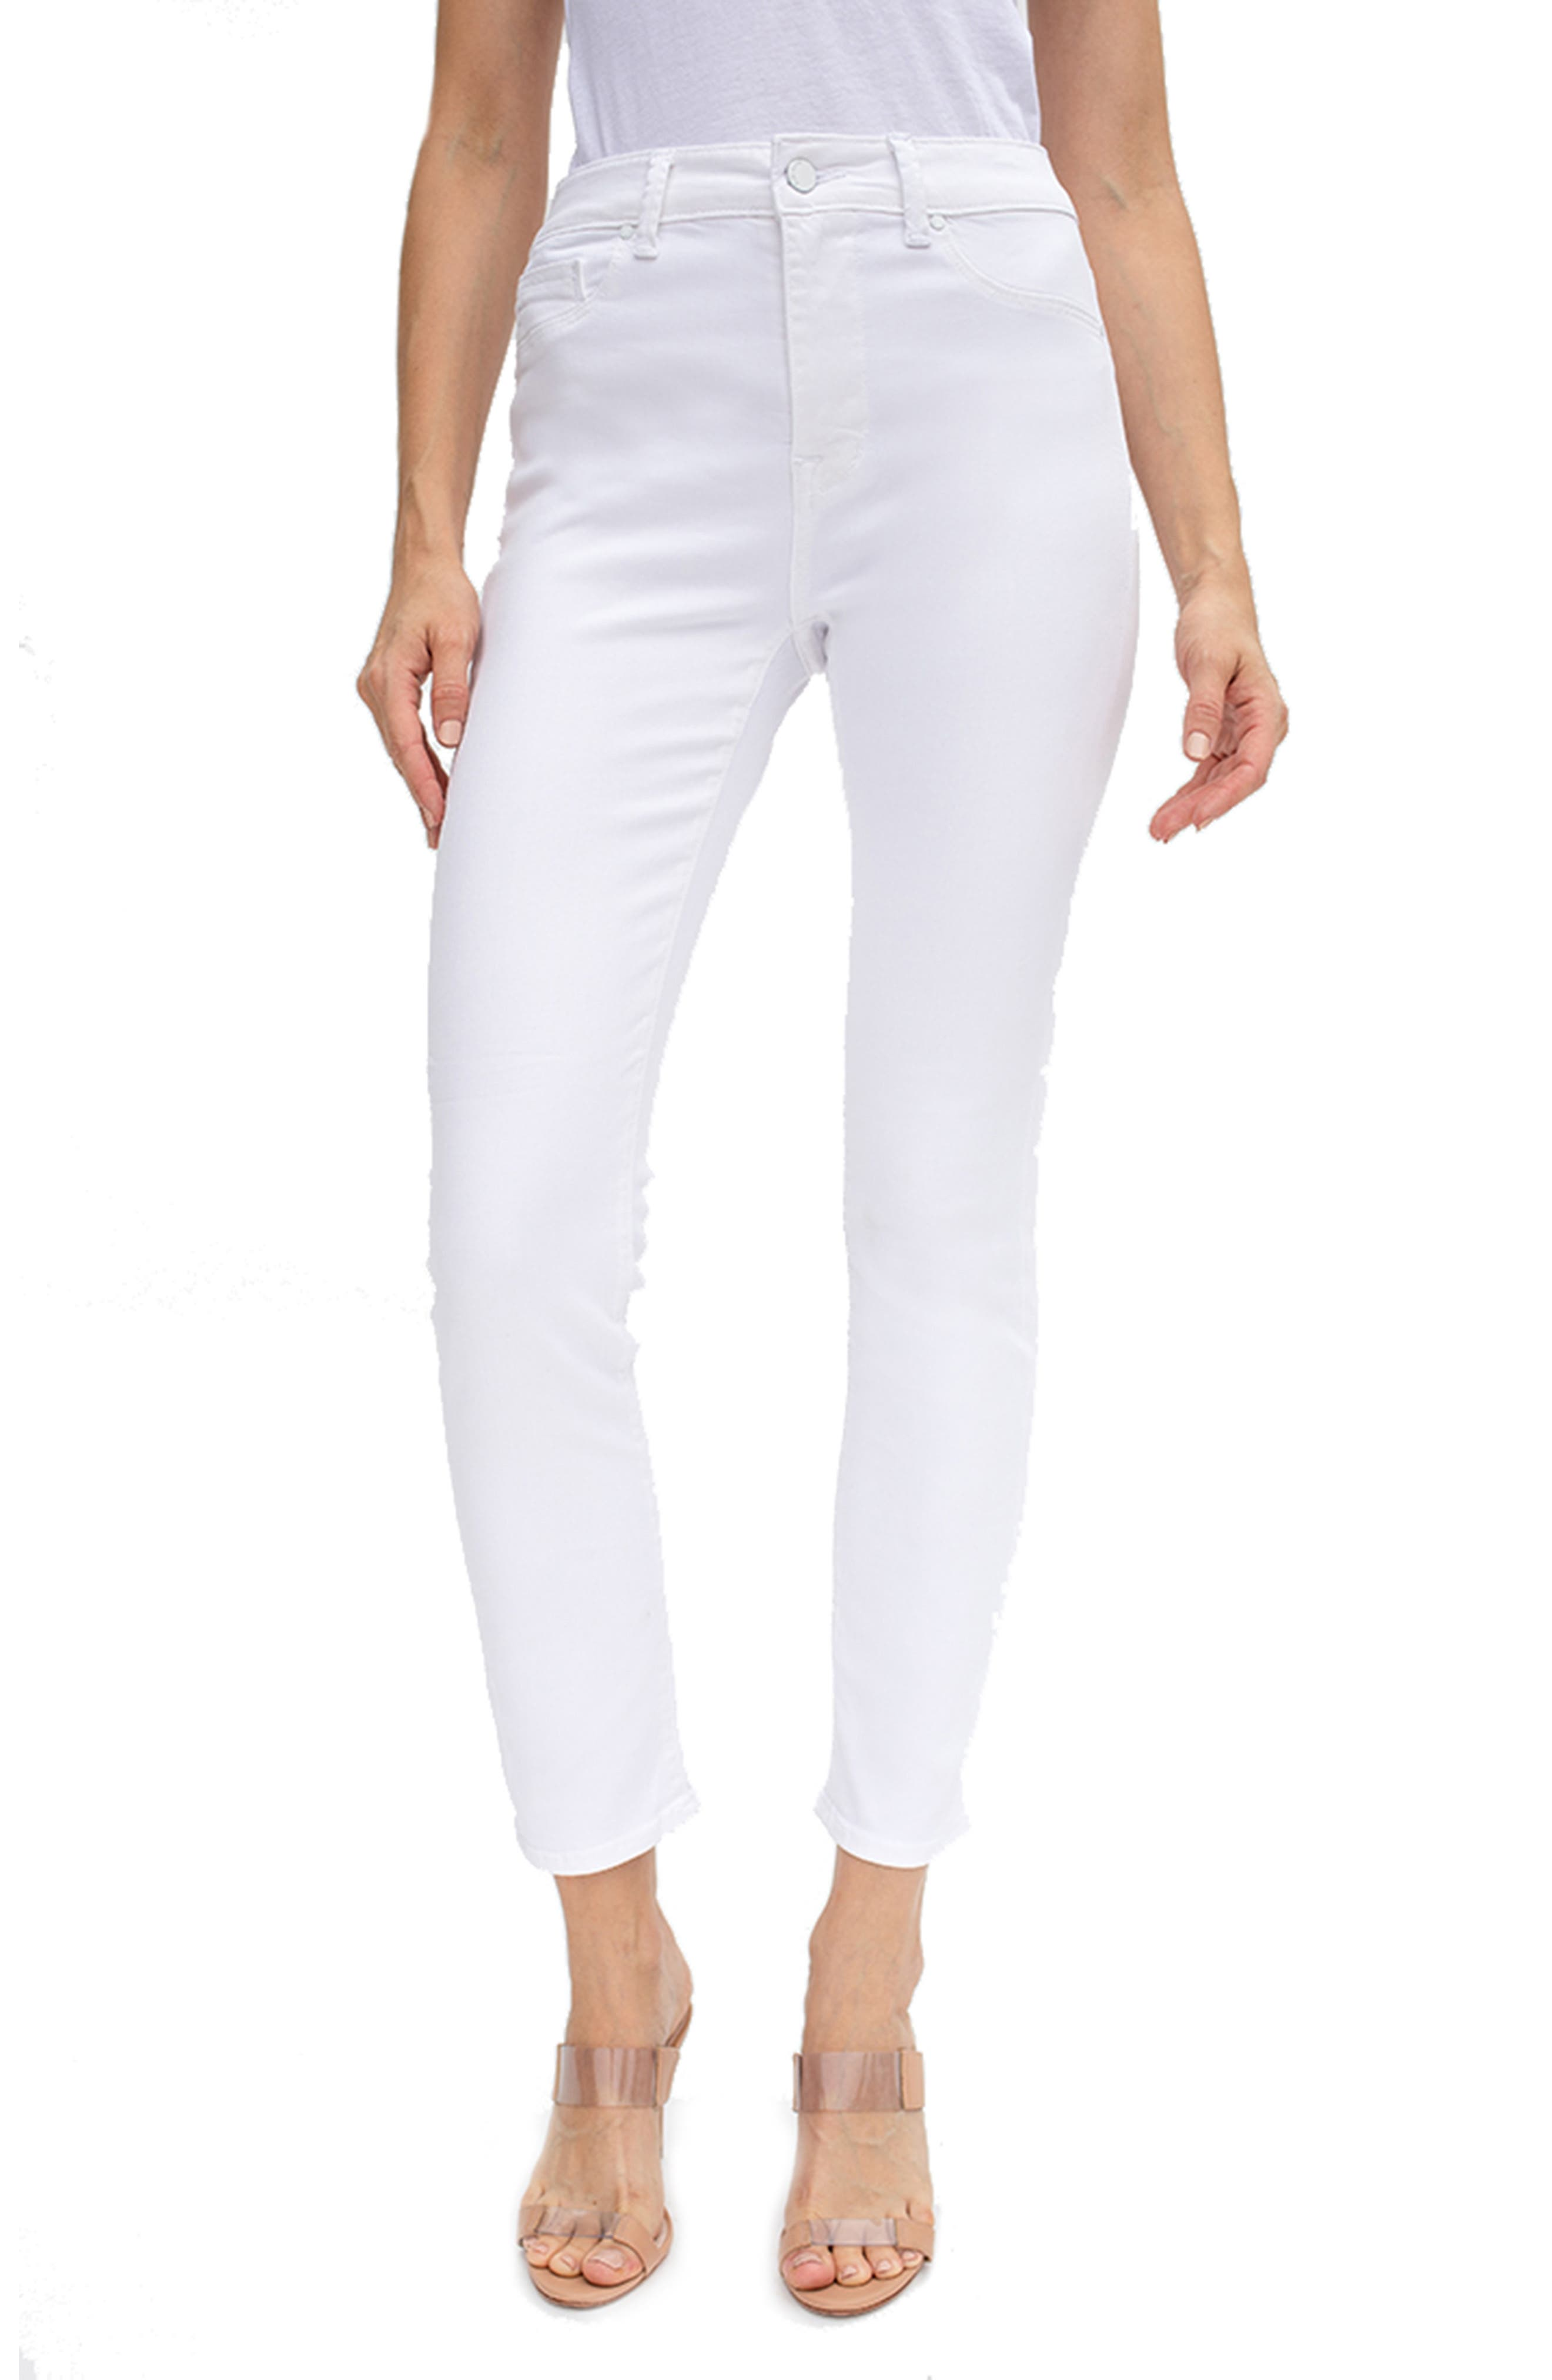 Gwen High Waist Ankle Skinny Jeans